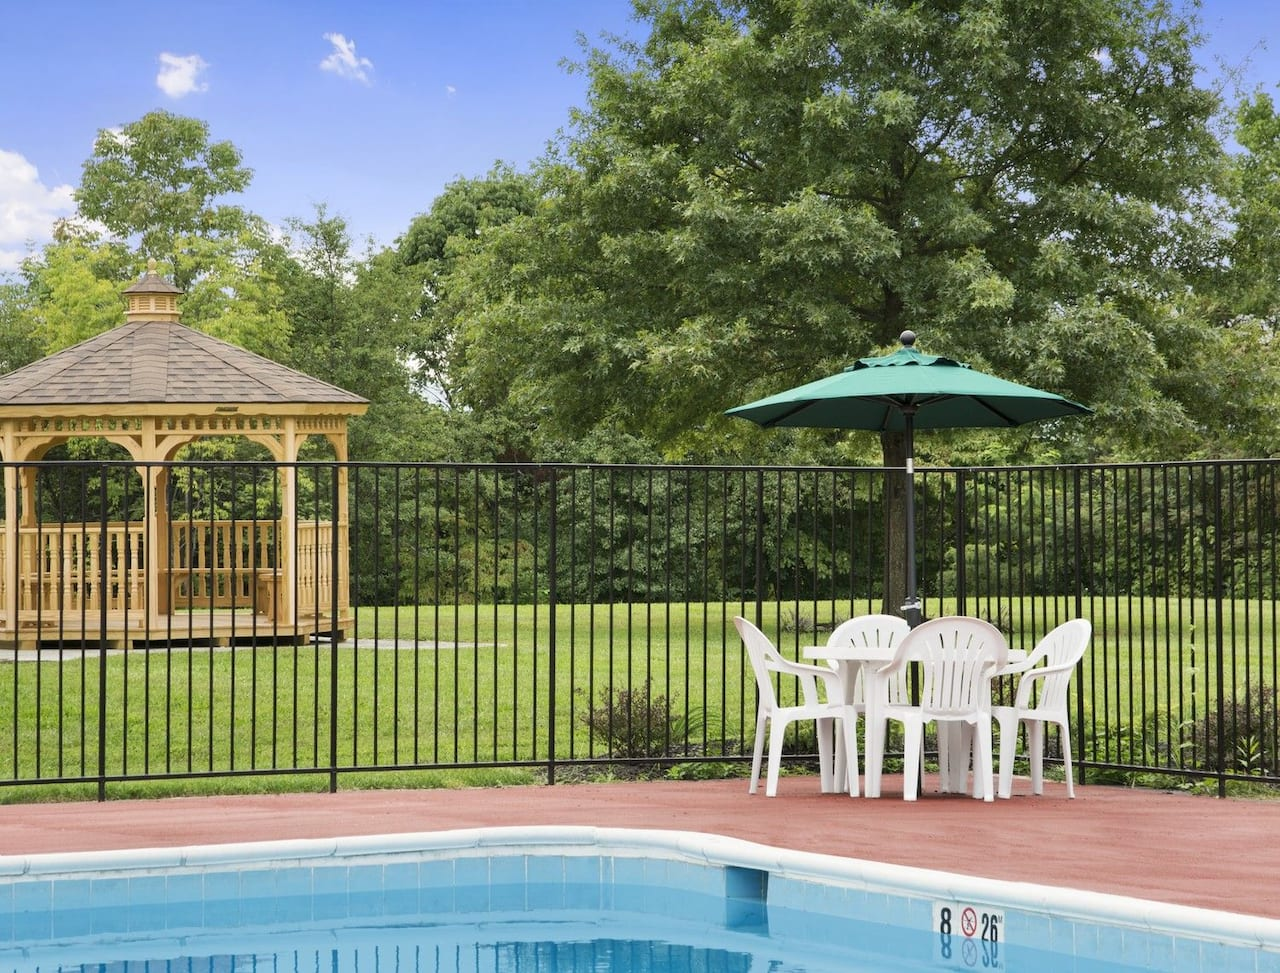 at the Baymont Inn & Suites Salem Roanoke Area in Salem, Virginia